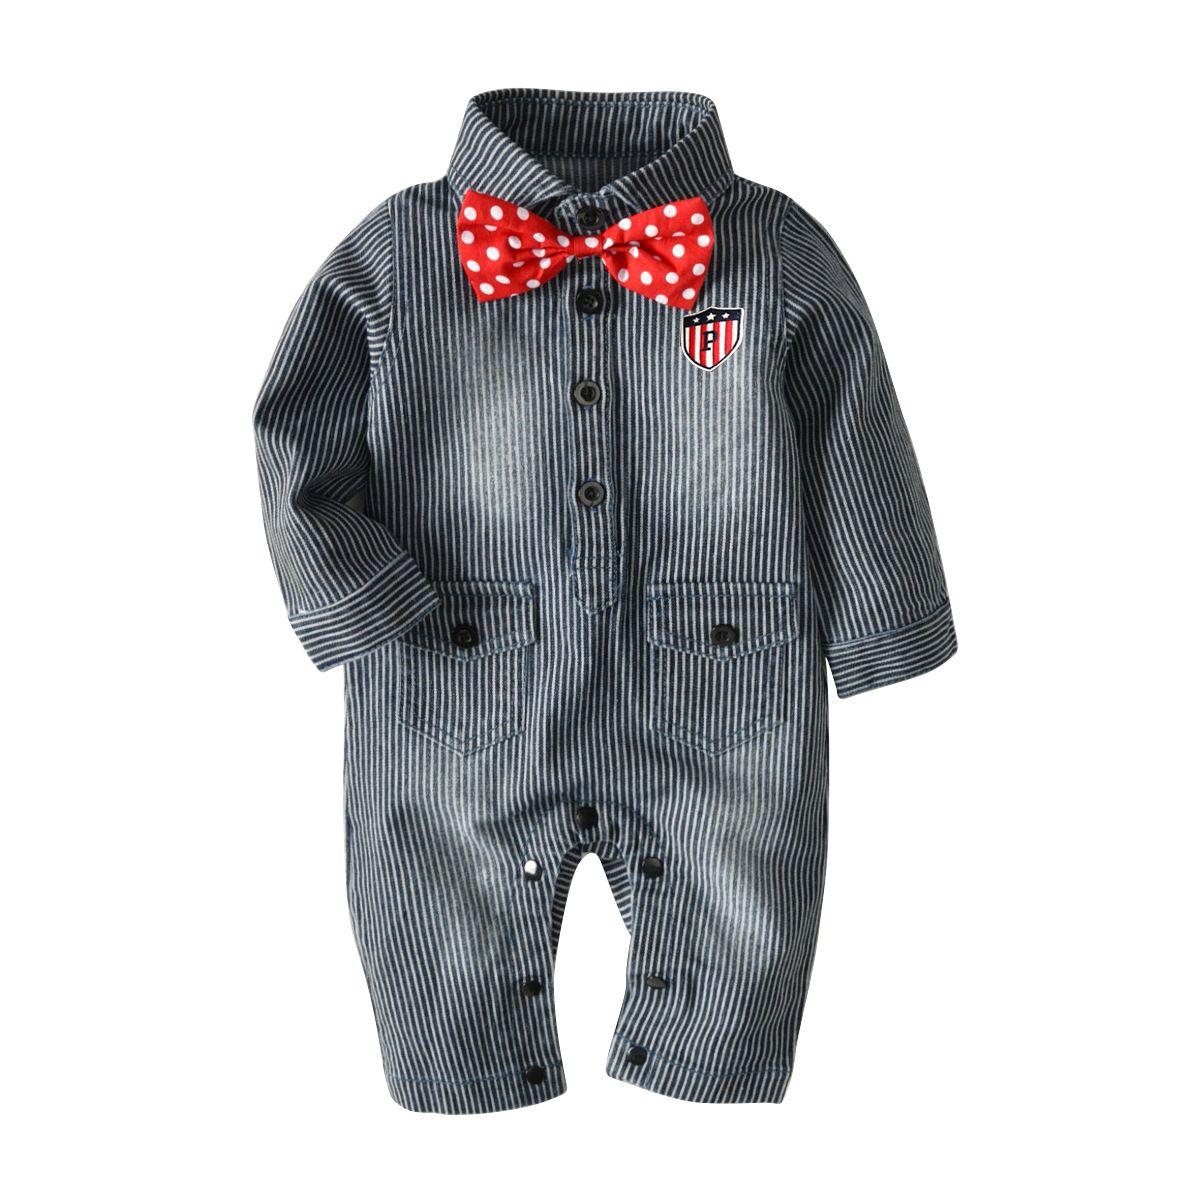 2018 frühling Herbst babykleidung Langärmelige babykleidung cartoon Gentleman Overalls babyspielanzug Säuglingskleidung Overalls